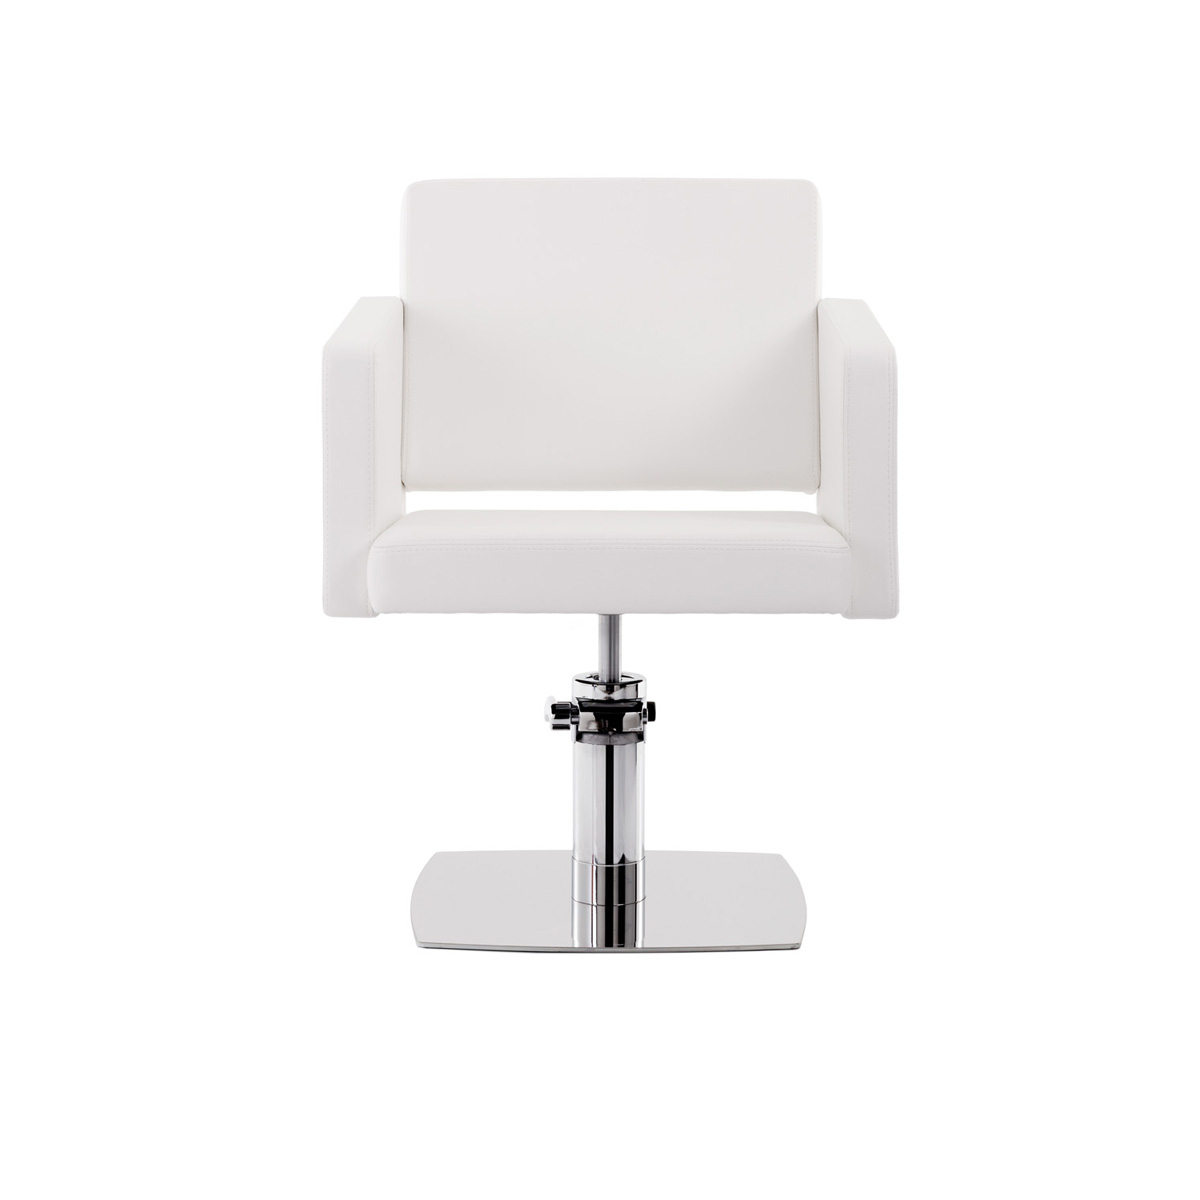 marsella fauteuil de coiffure mobicoiff. Black Bedroom Furniture Sets. Home Design Ideas